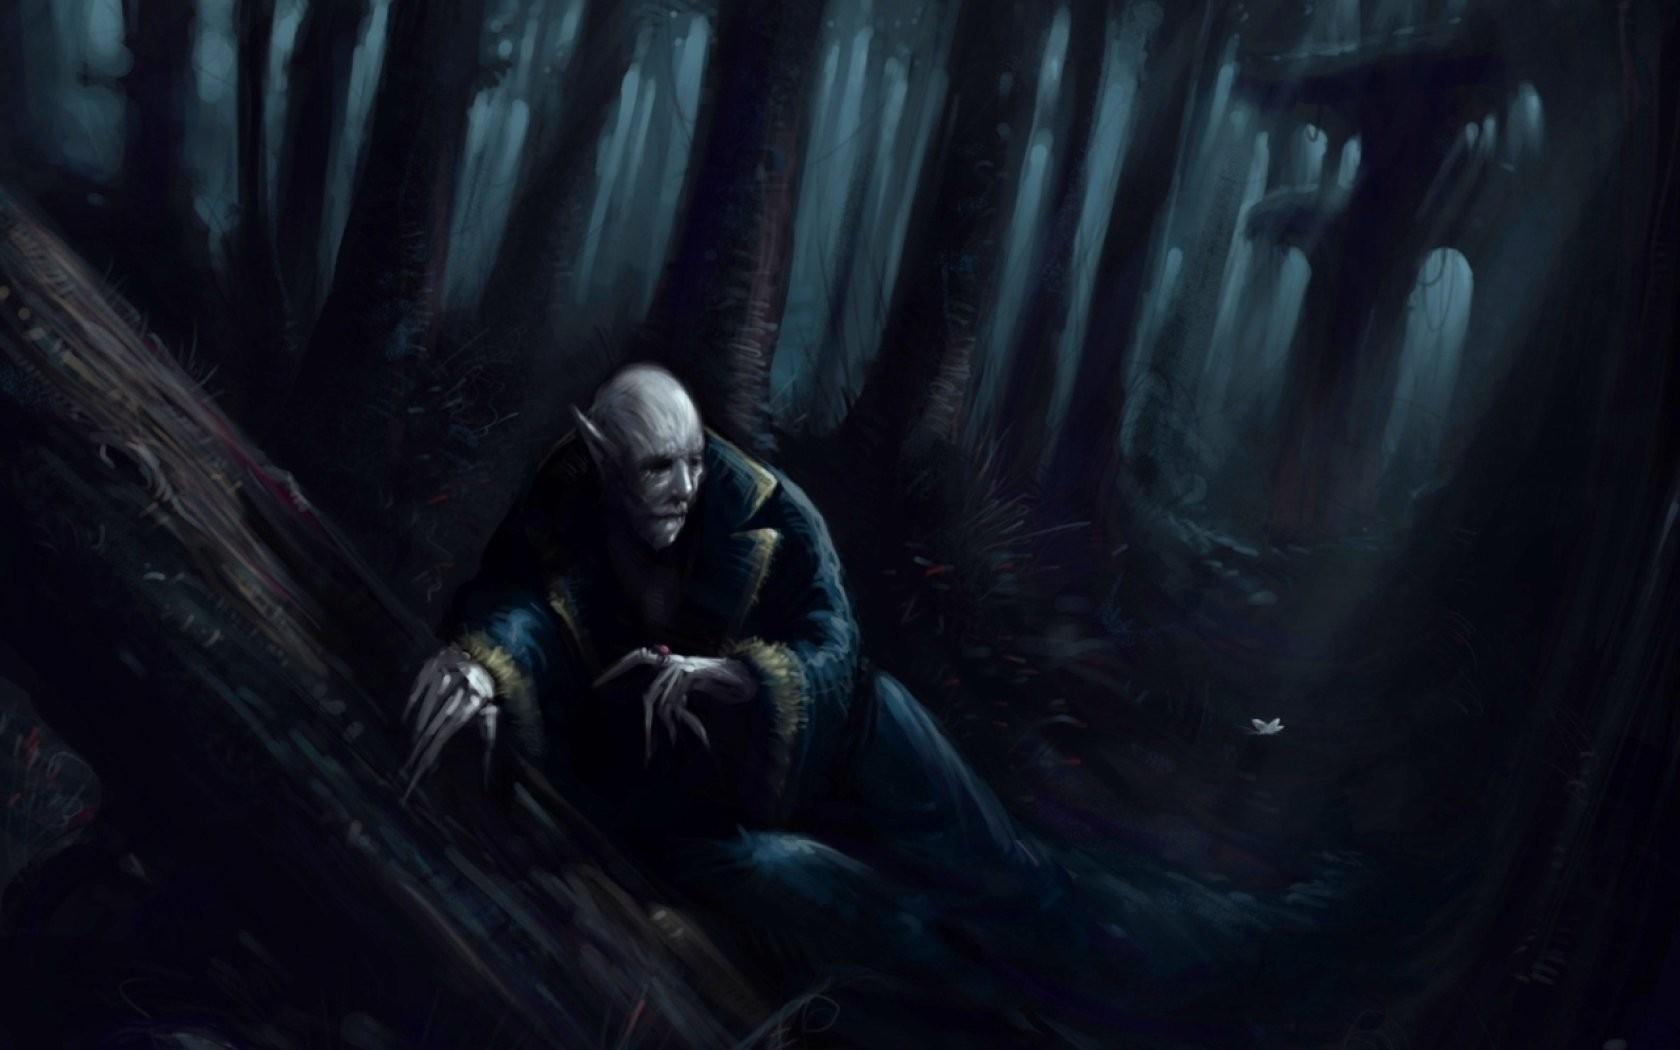 Original, Fantasy, Dark Wallpapers, Creepy, Horror, - Darkness - HD Wallpaper